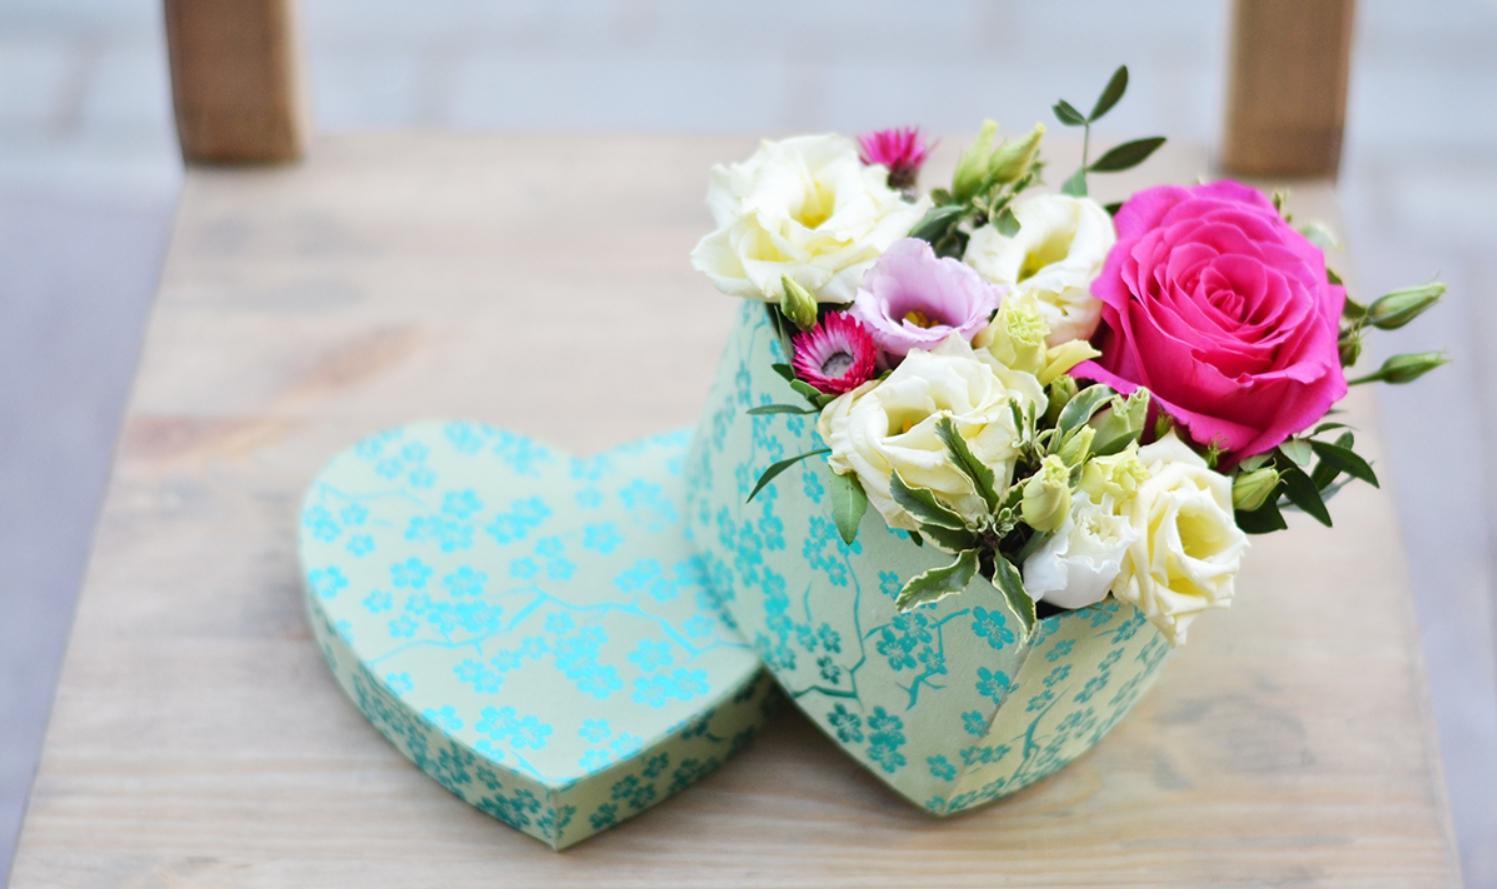 Юмор картинках, открытка коробка с цветами